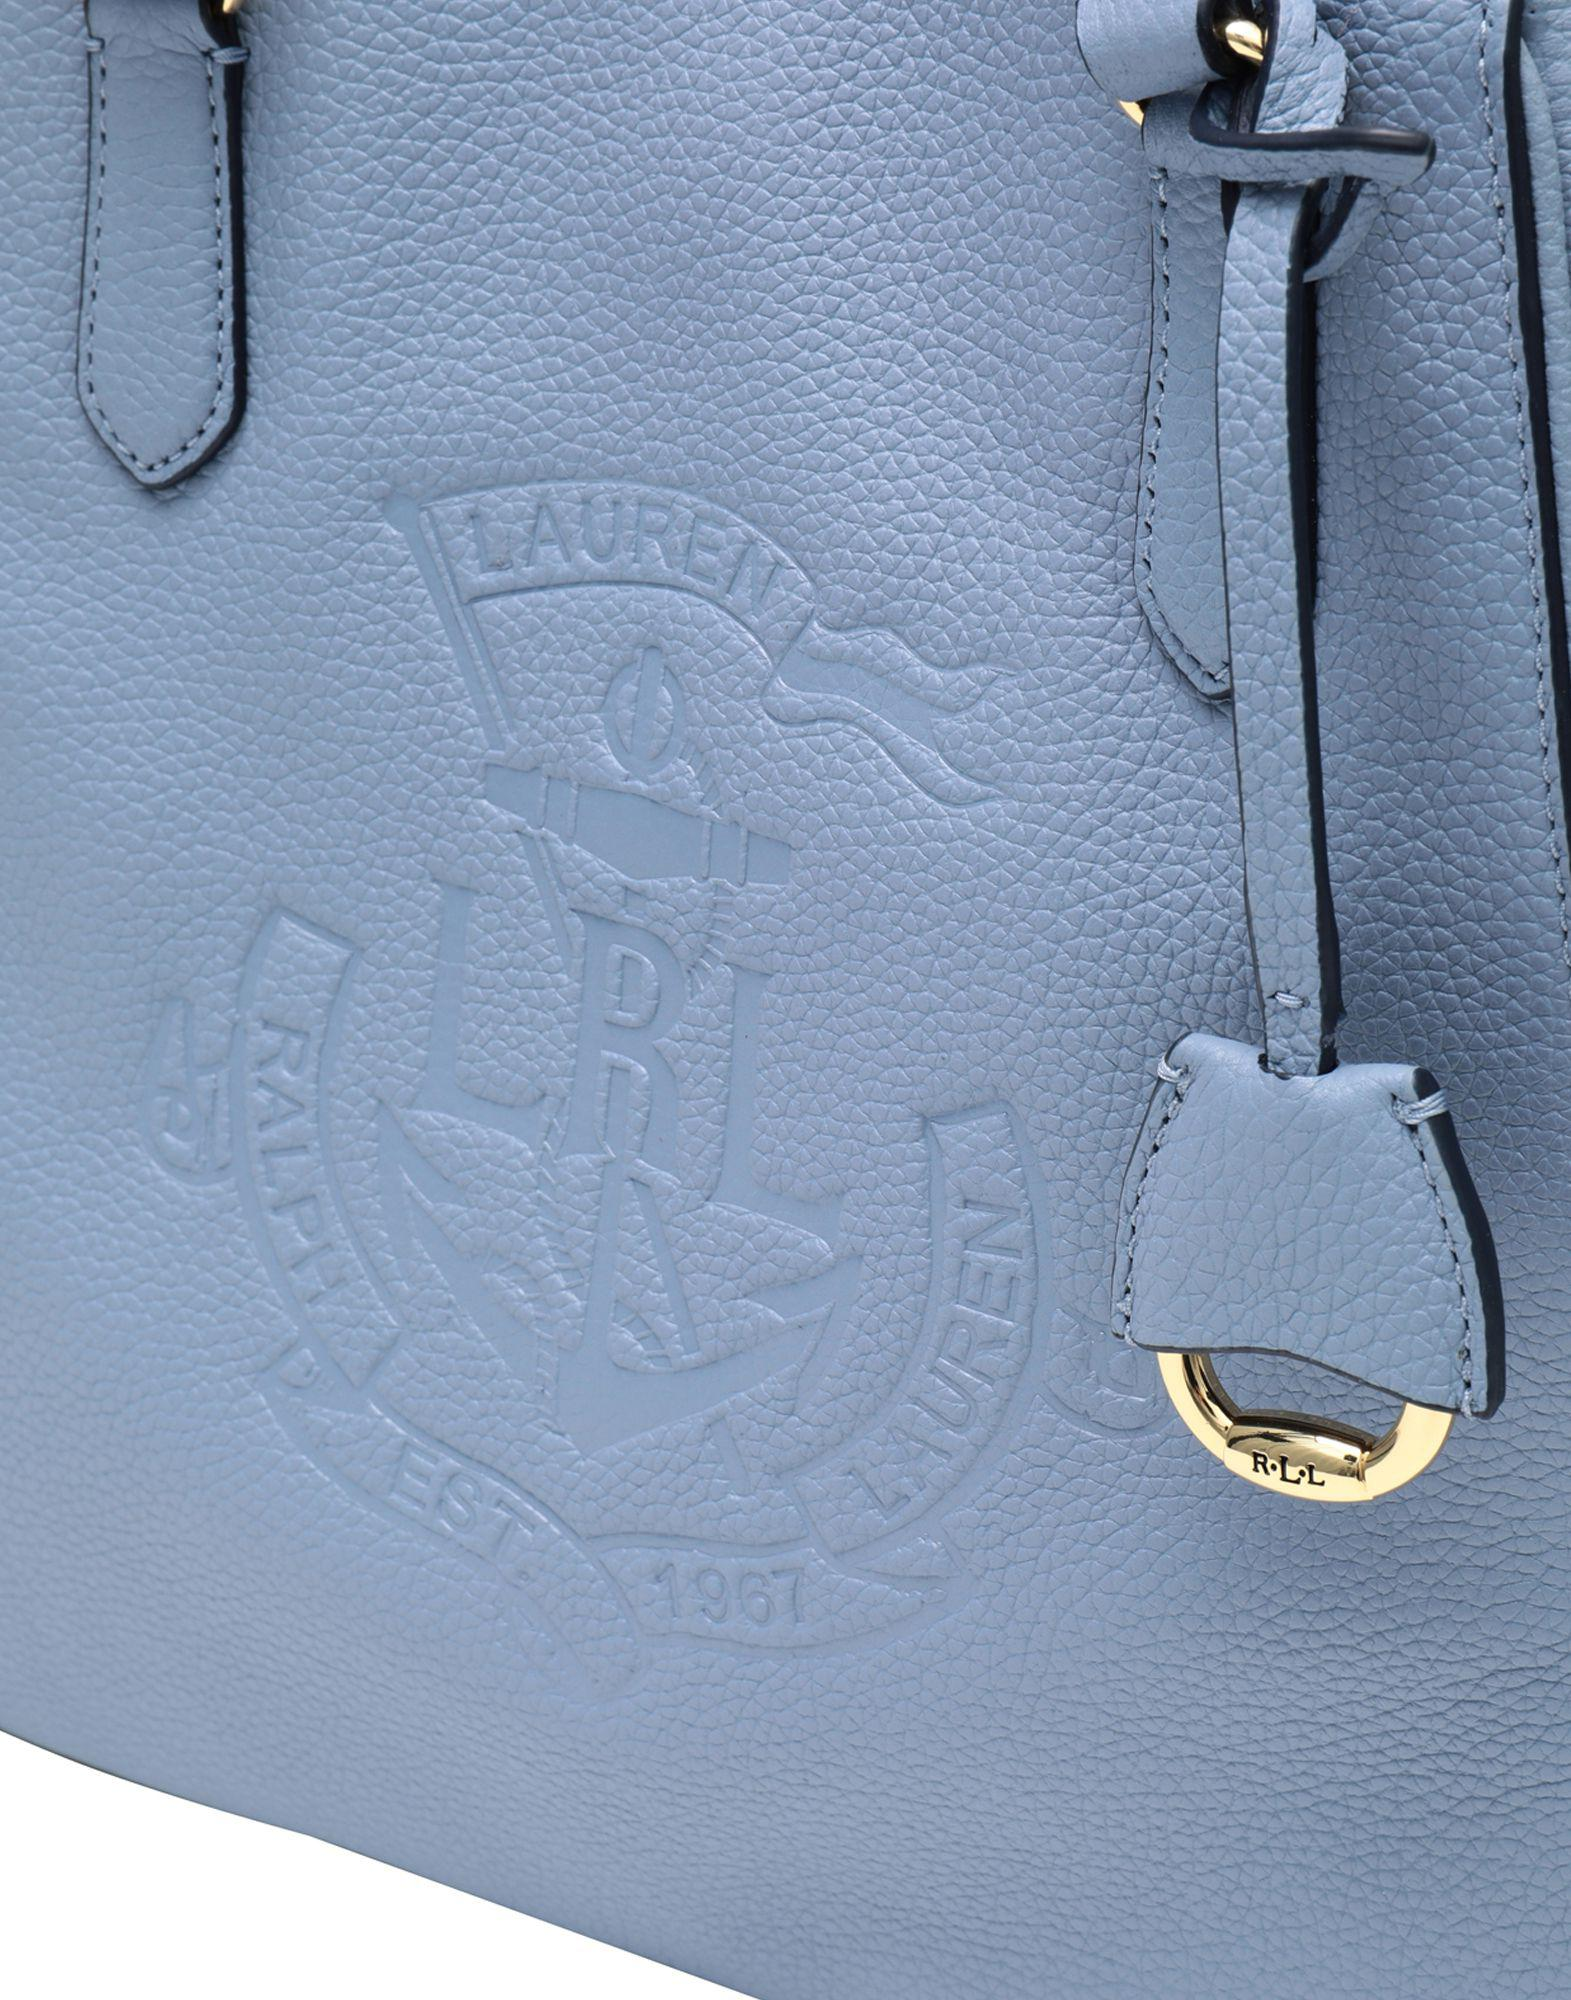 cac6b4db4a Lyst - Sac à main Lauren by Ralph Lauren en coloris Bleu